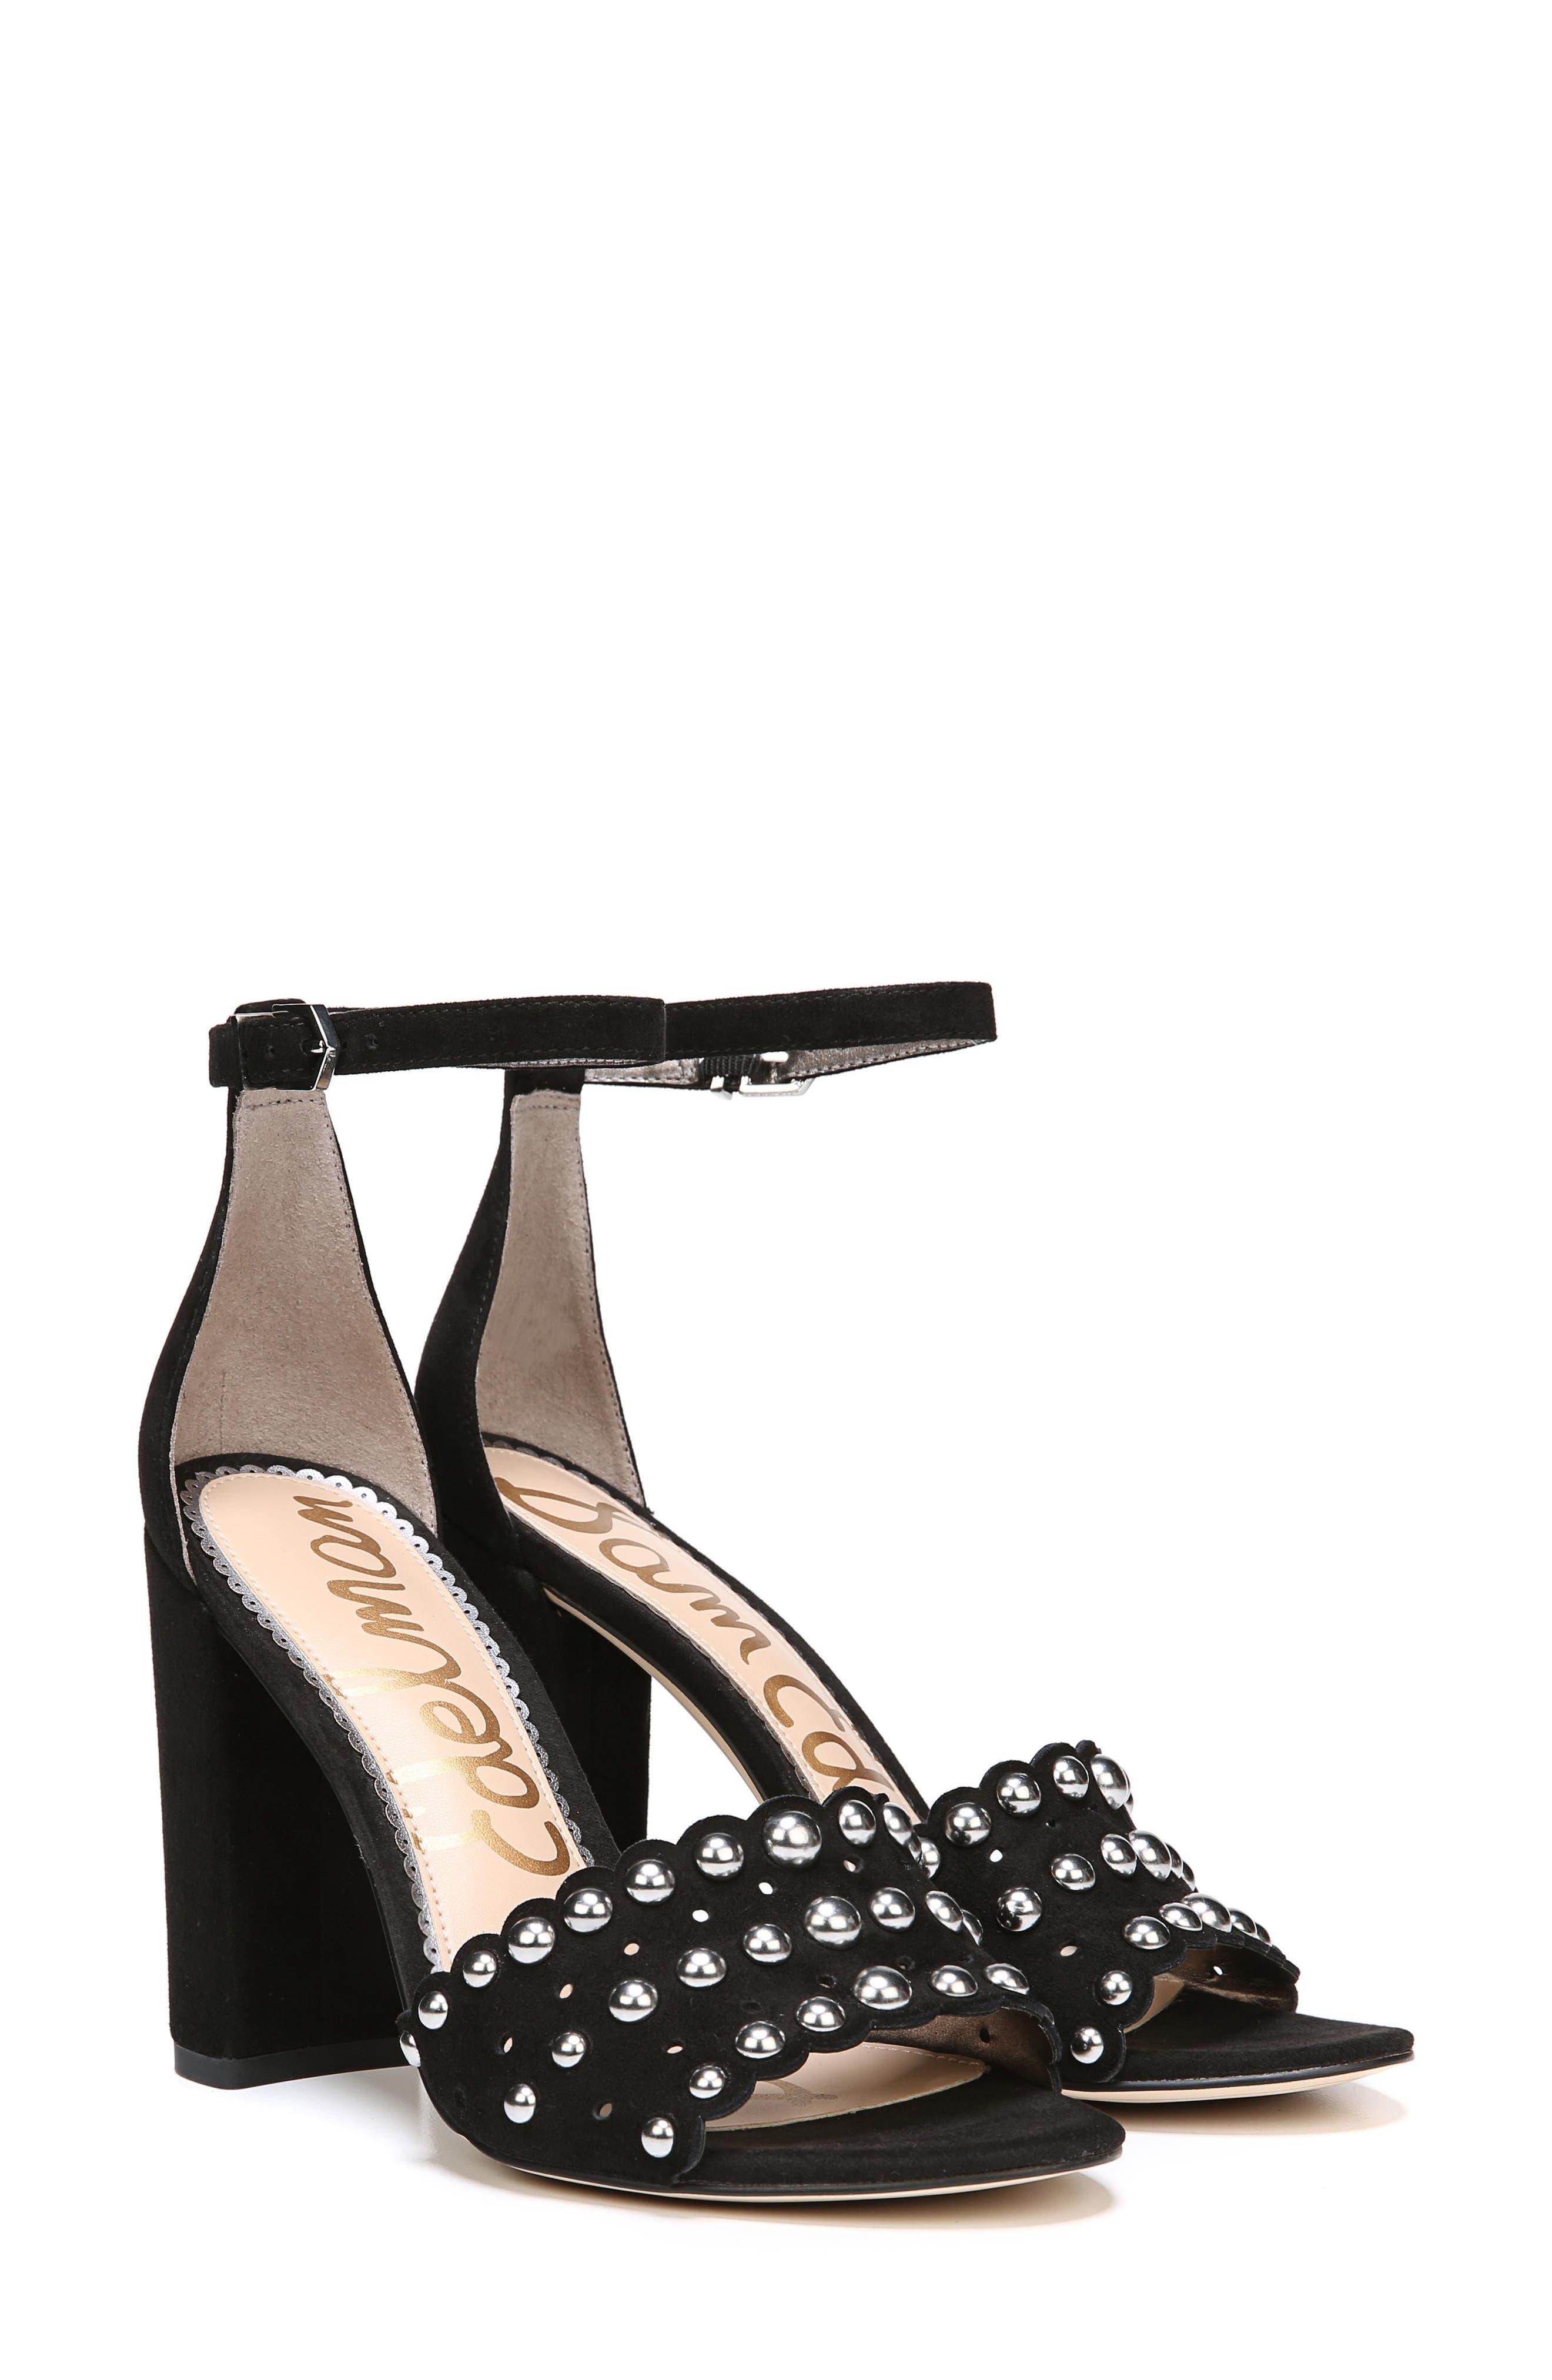 Yaria Studded Block Heel Sandal,                         Main,                         color, 001